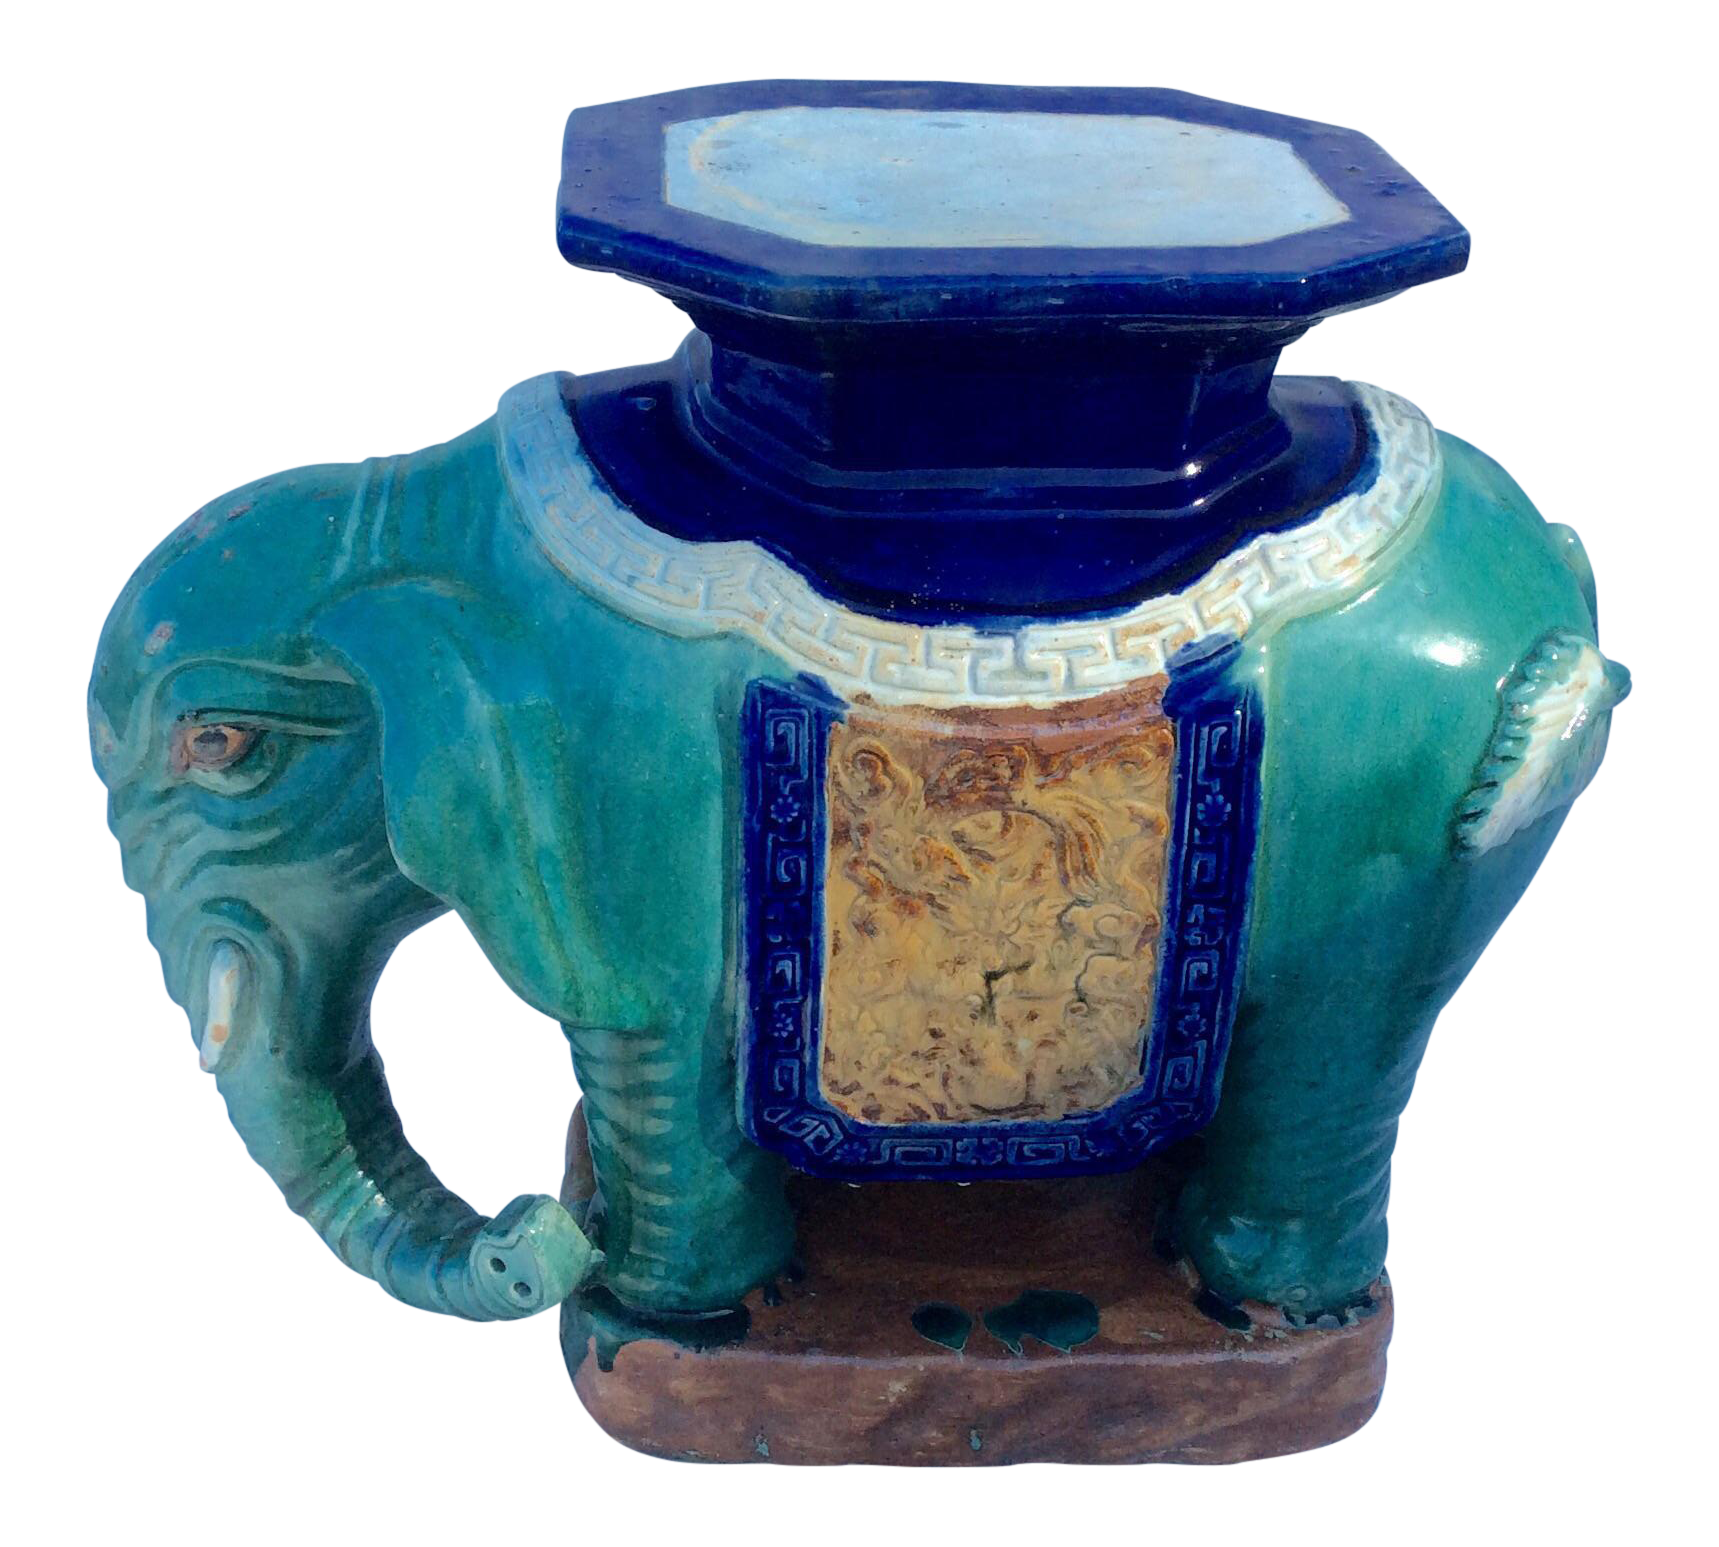 Vintage Ceramic Elephant Garden Seat Stool  sc 1 st  Chairish & Vintage u0026 Used Garden Stools | Chairish islam-shia.org